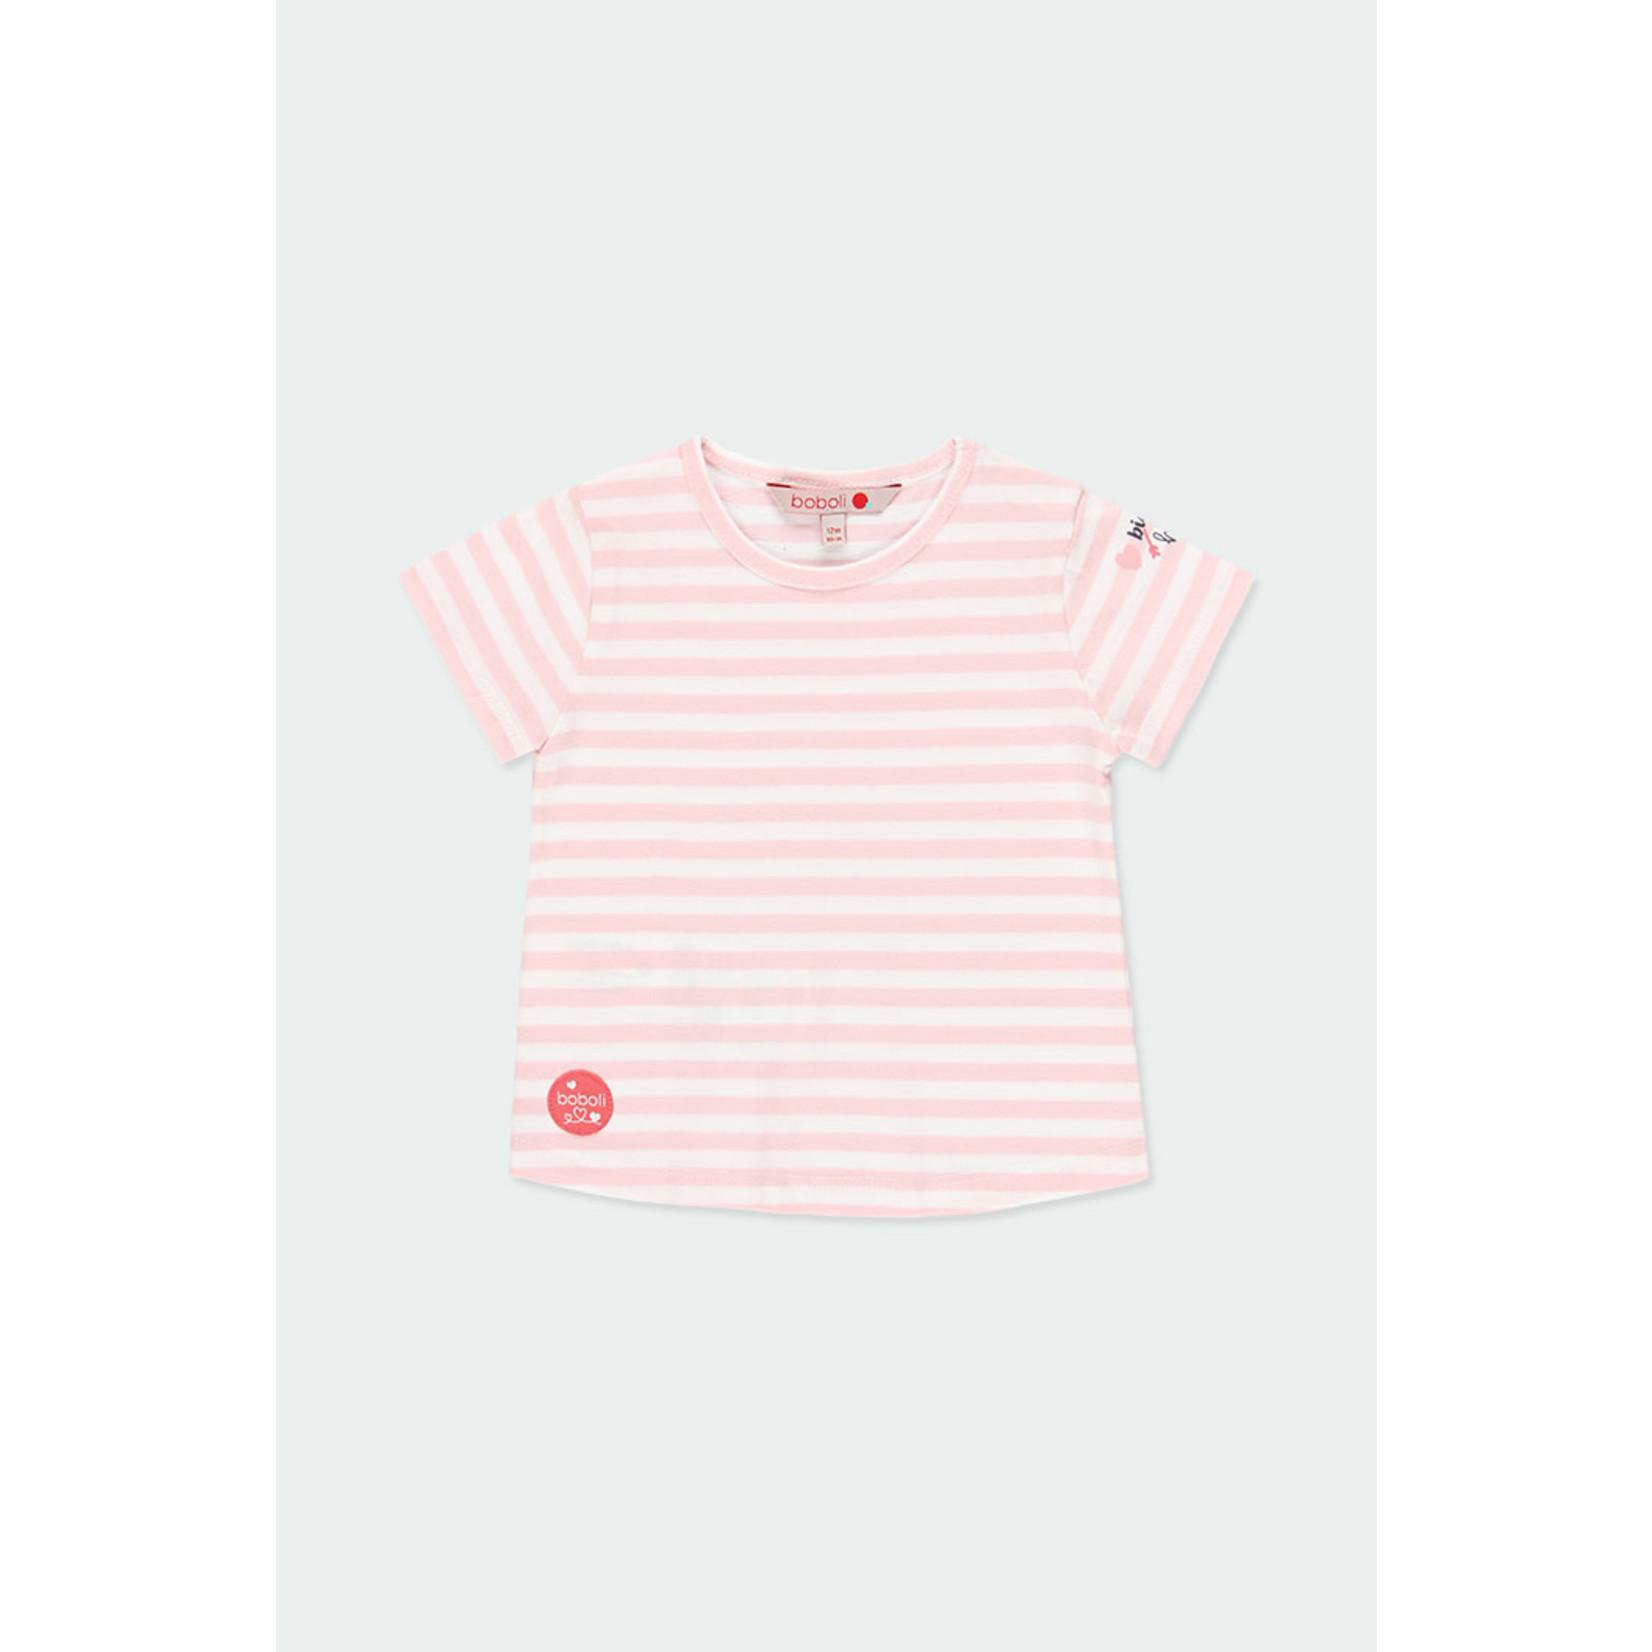 Bóboli Knit t-Shirt striped for baby girl